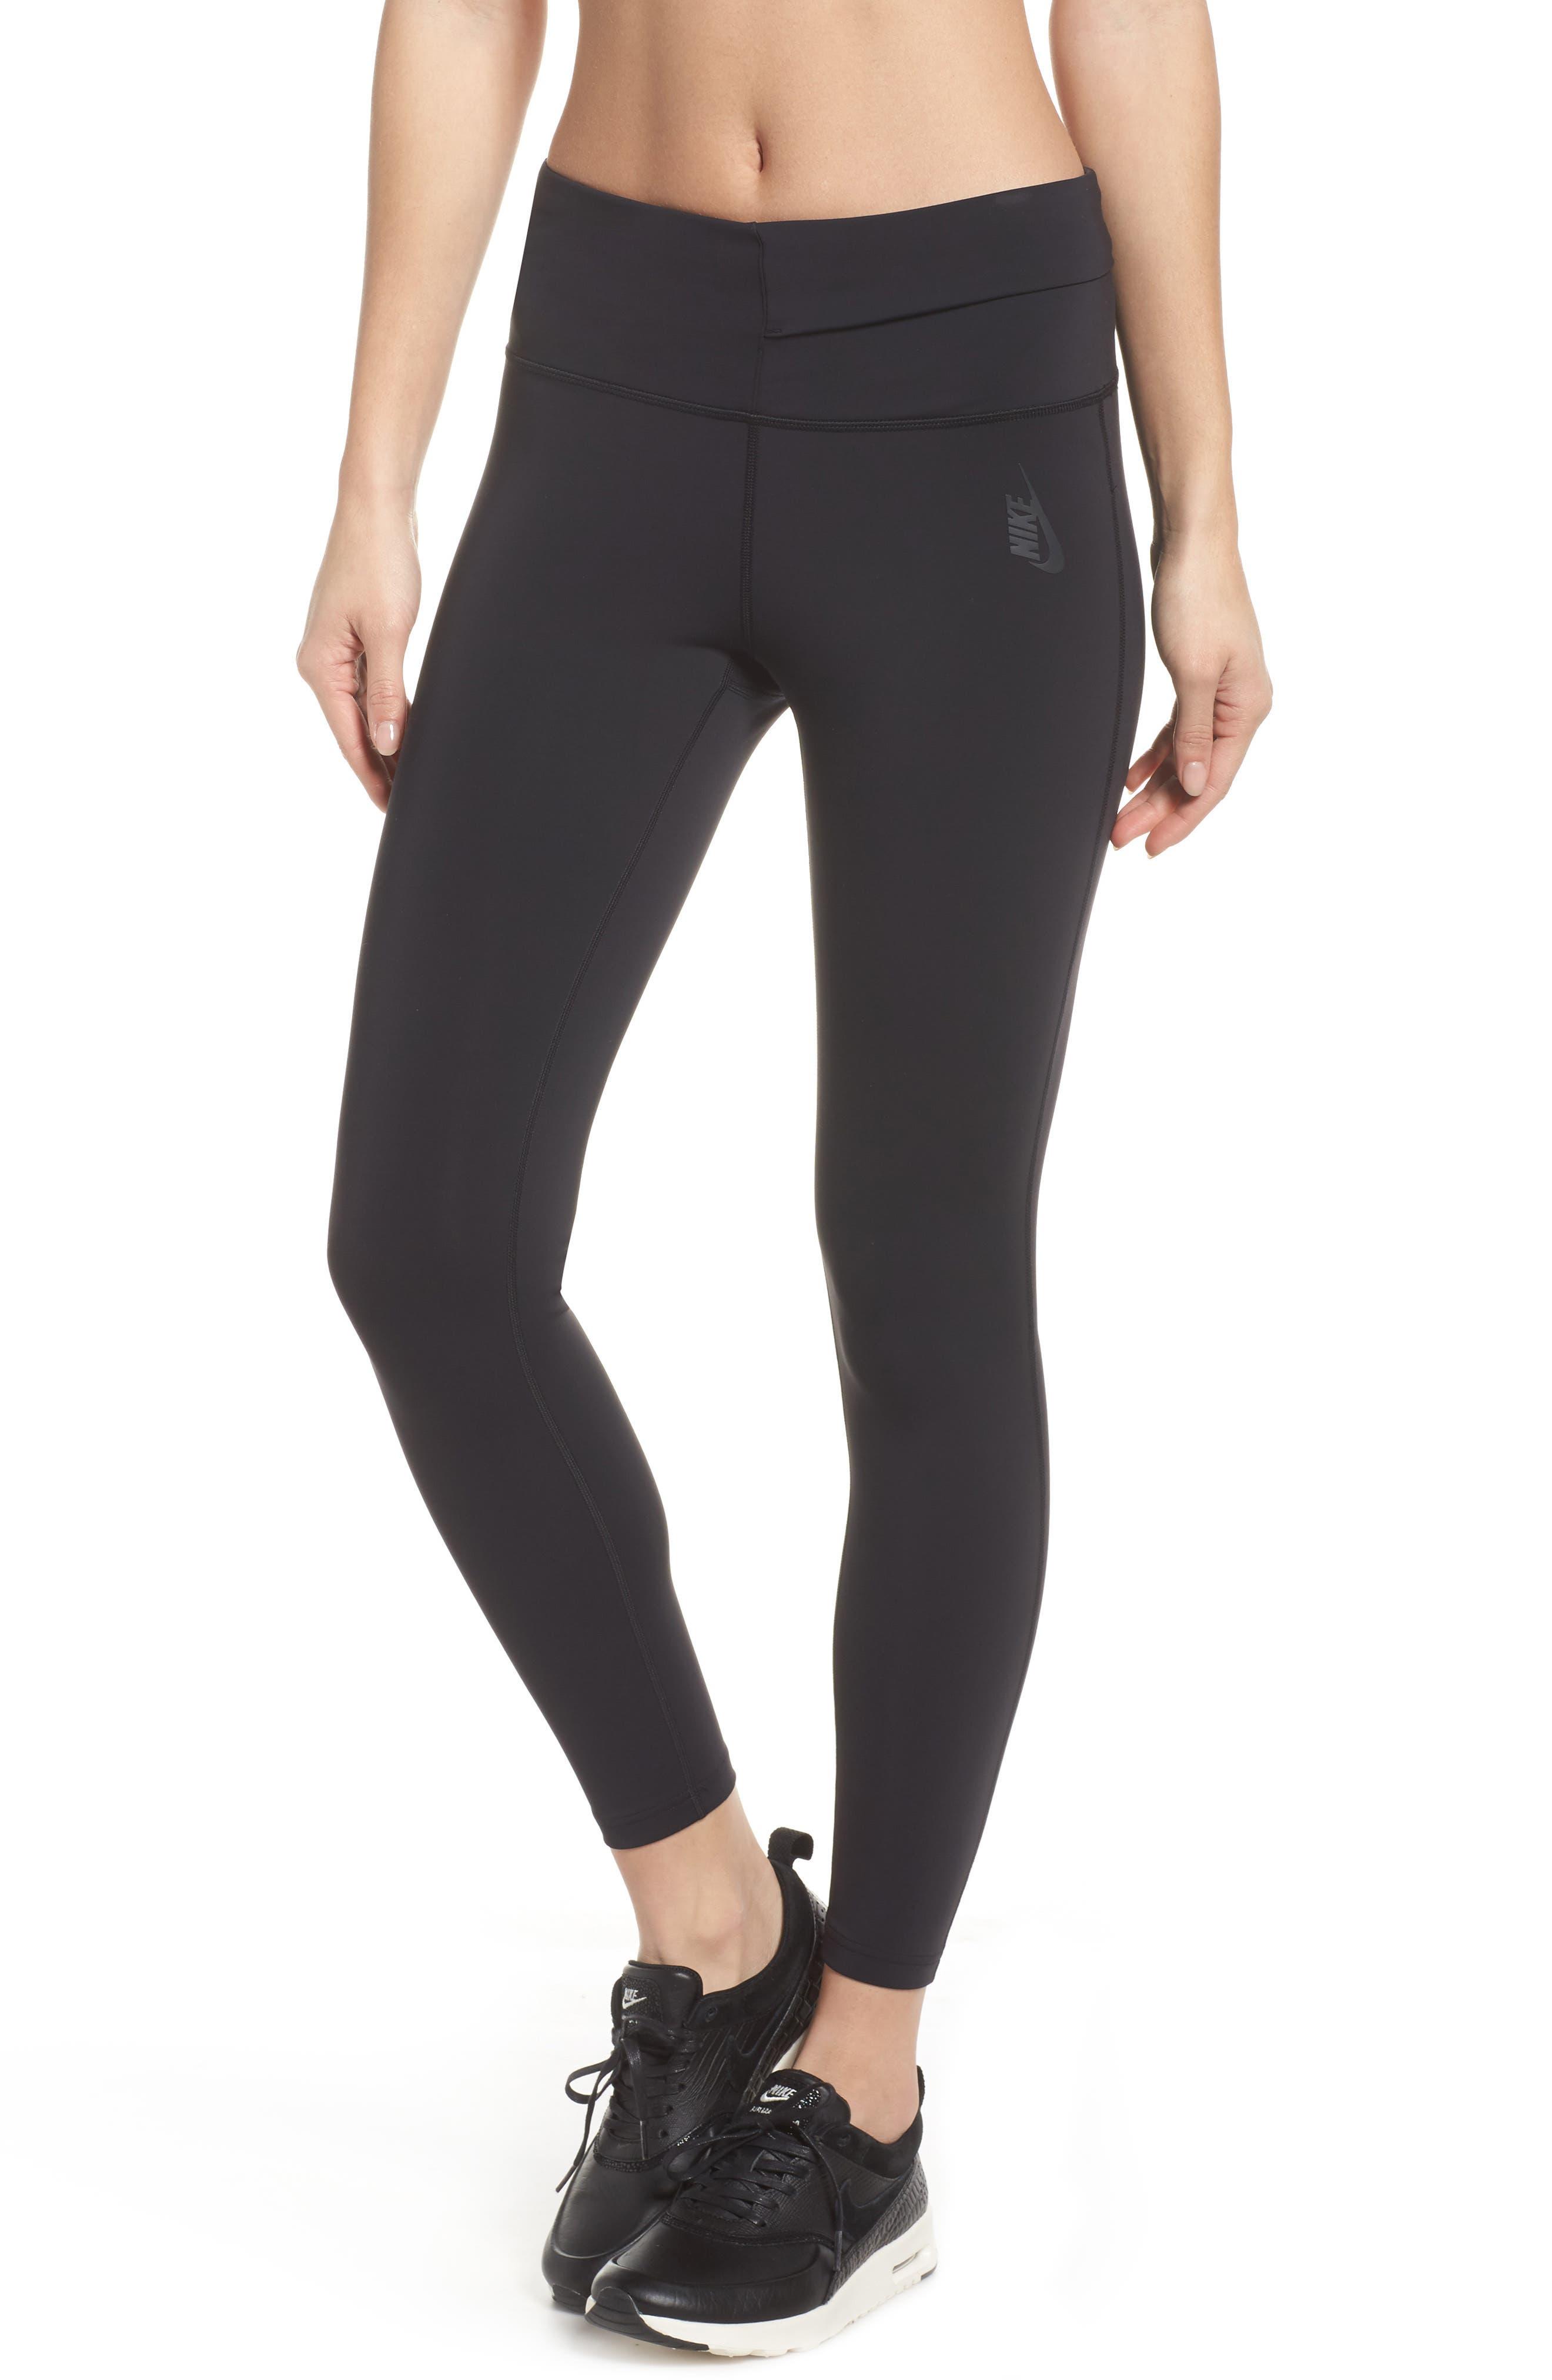 NikeLab Women's Tights,                         Main,                         color, BLACK/ BLACK